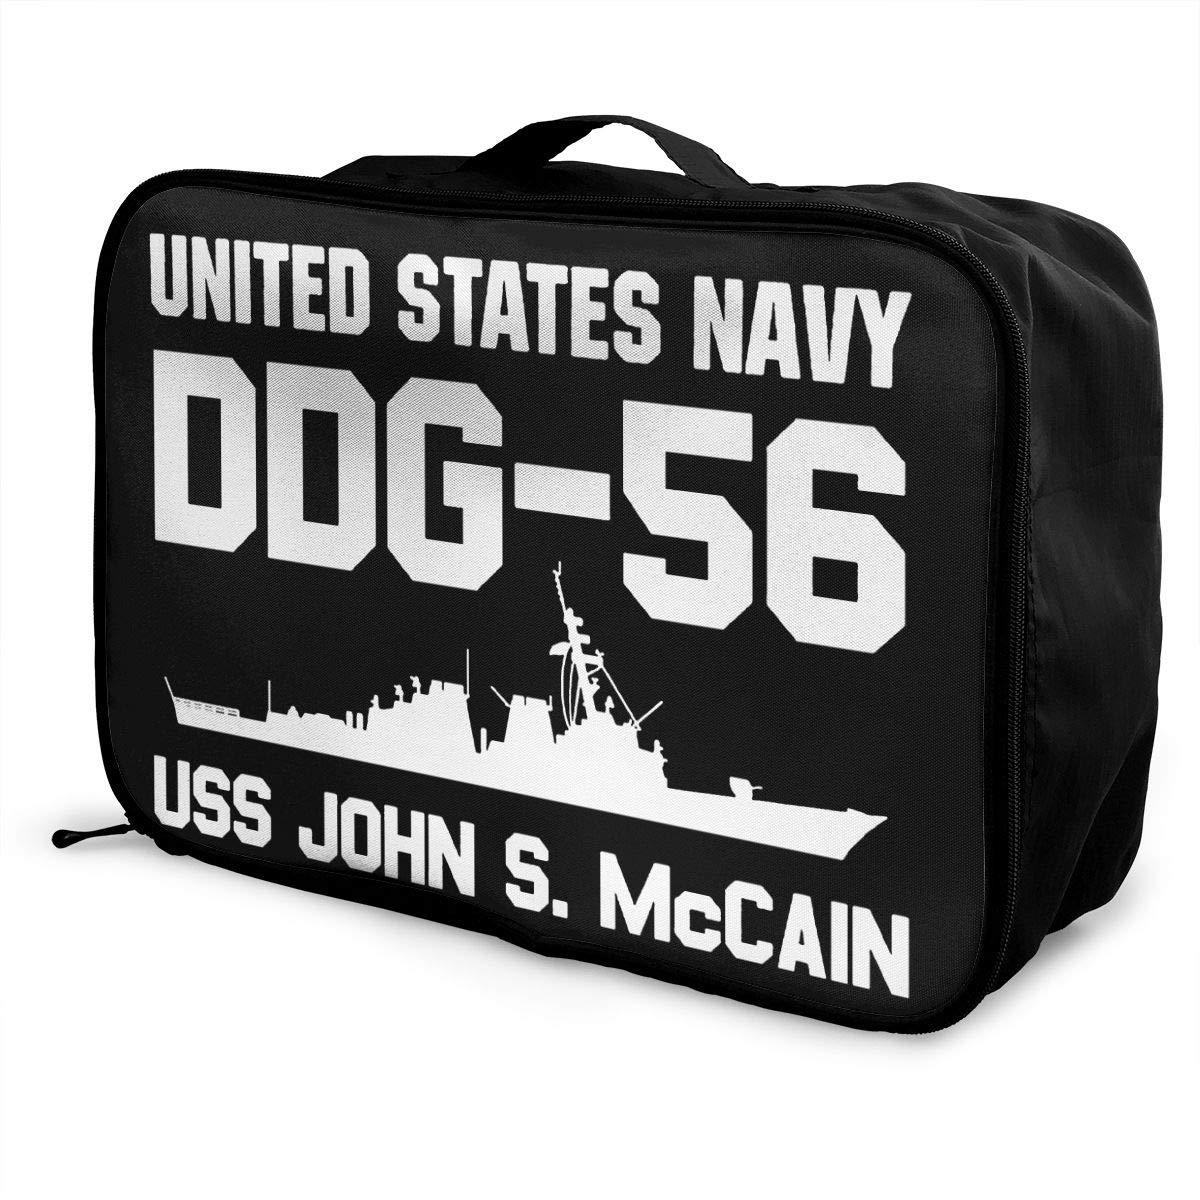 DDG-56 USS John S McCain Travel Bag Men Women 3D Print Pattern Gift Portable Waterproof Oxford Cloth Luggage Bag